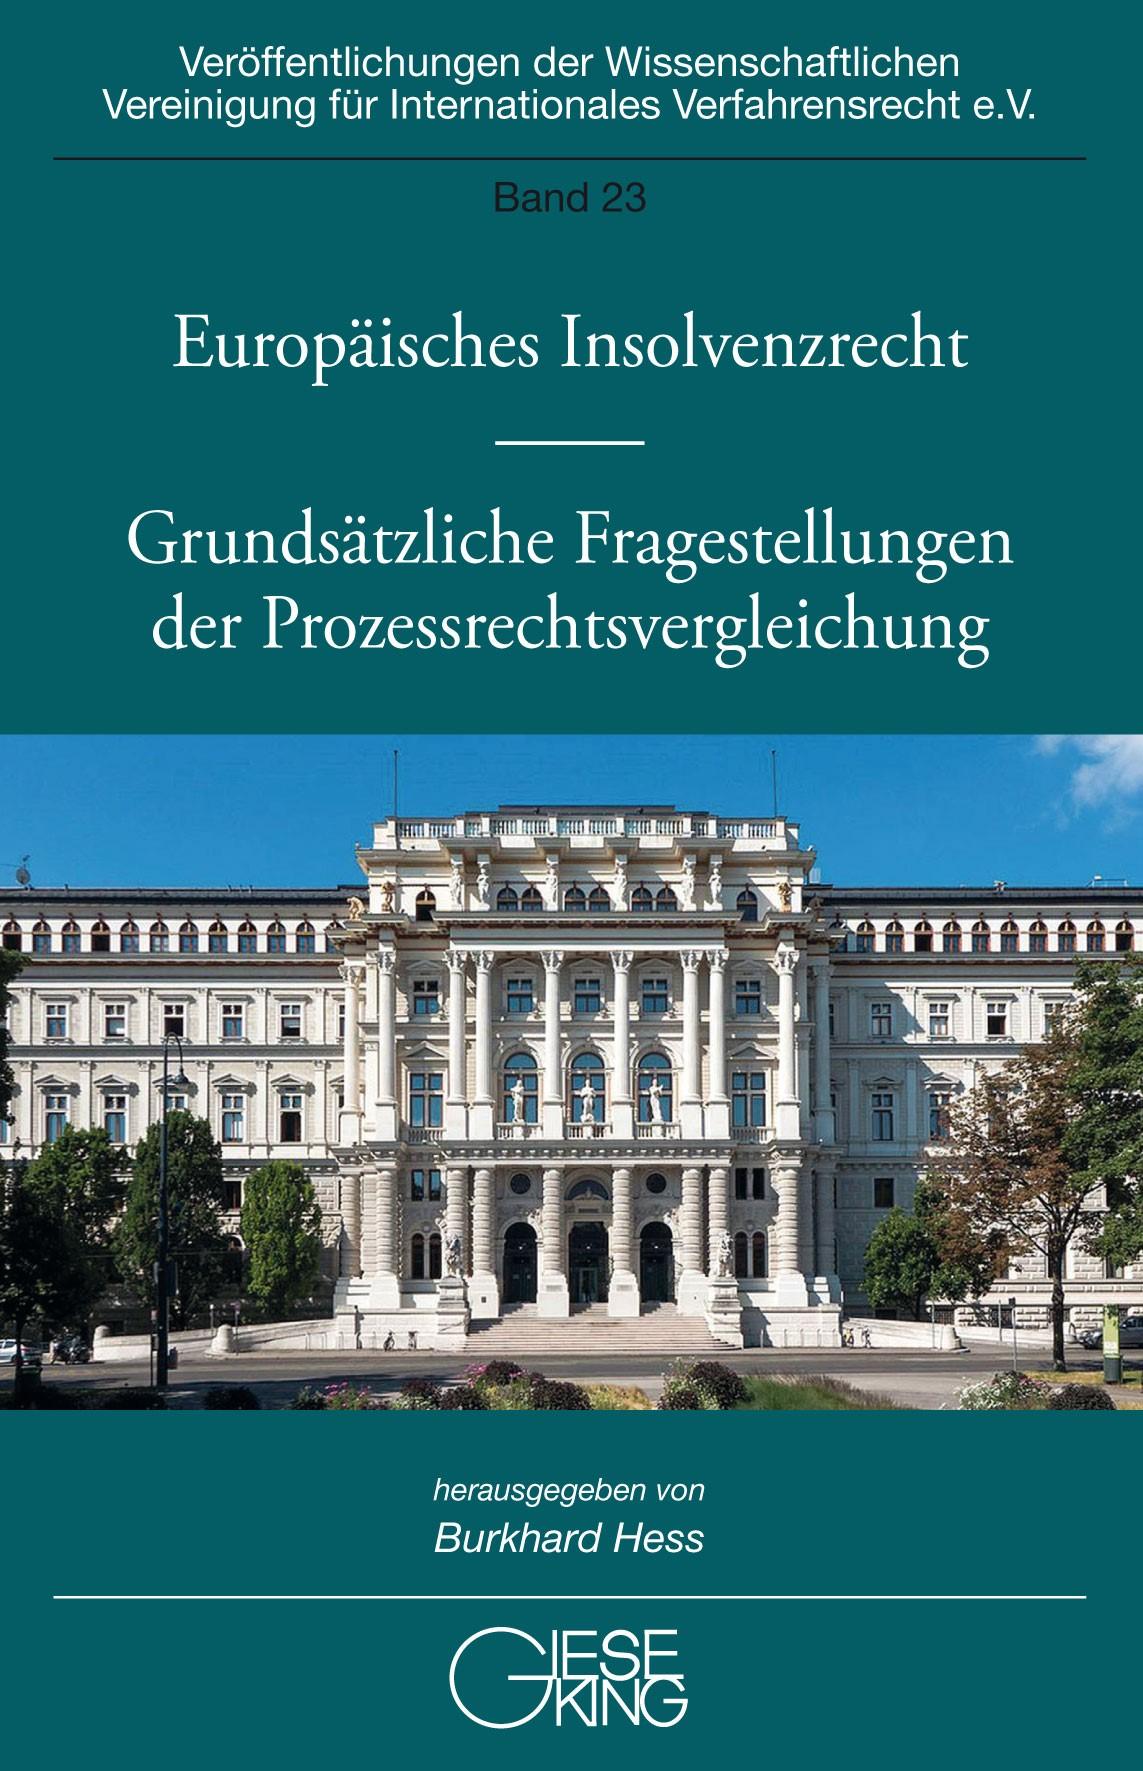 Europäisches Insolvenzrecht – Grundsätzliche Fragestellungen der Prozessrechtsvergleichung | Hess (Hrsg.), 2019 | Buch (Cover)